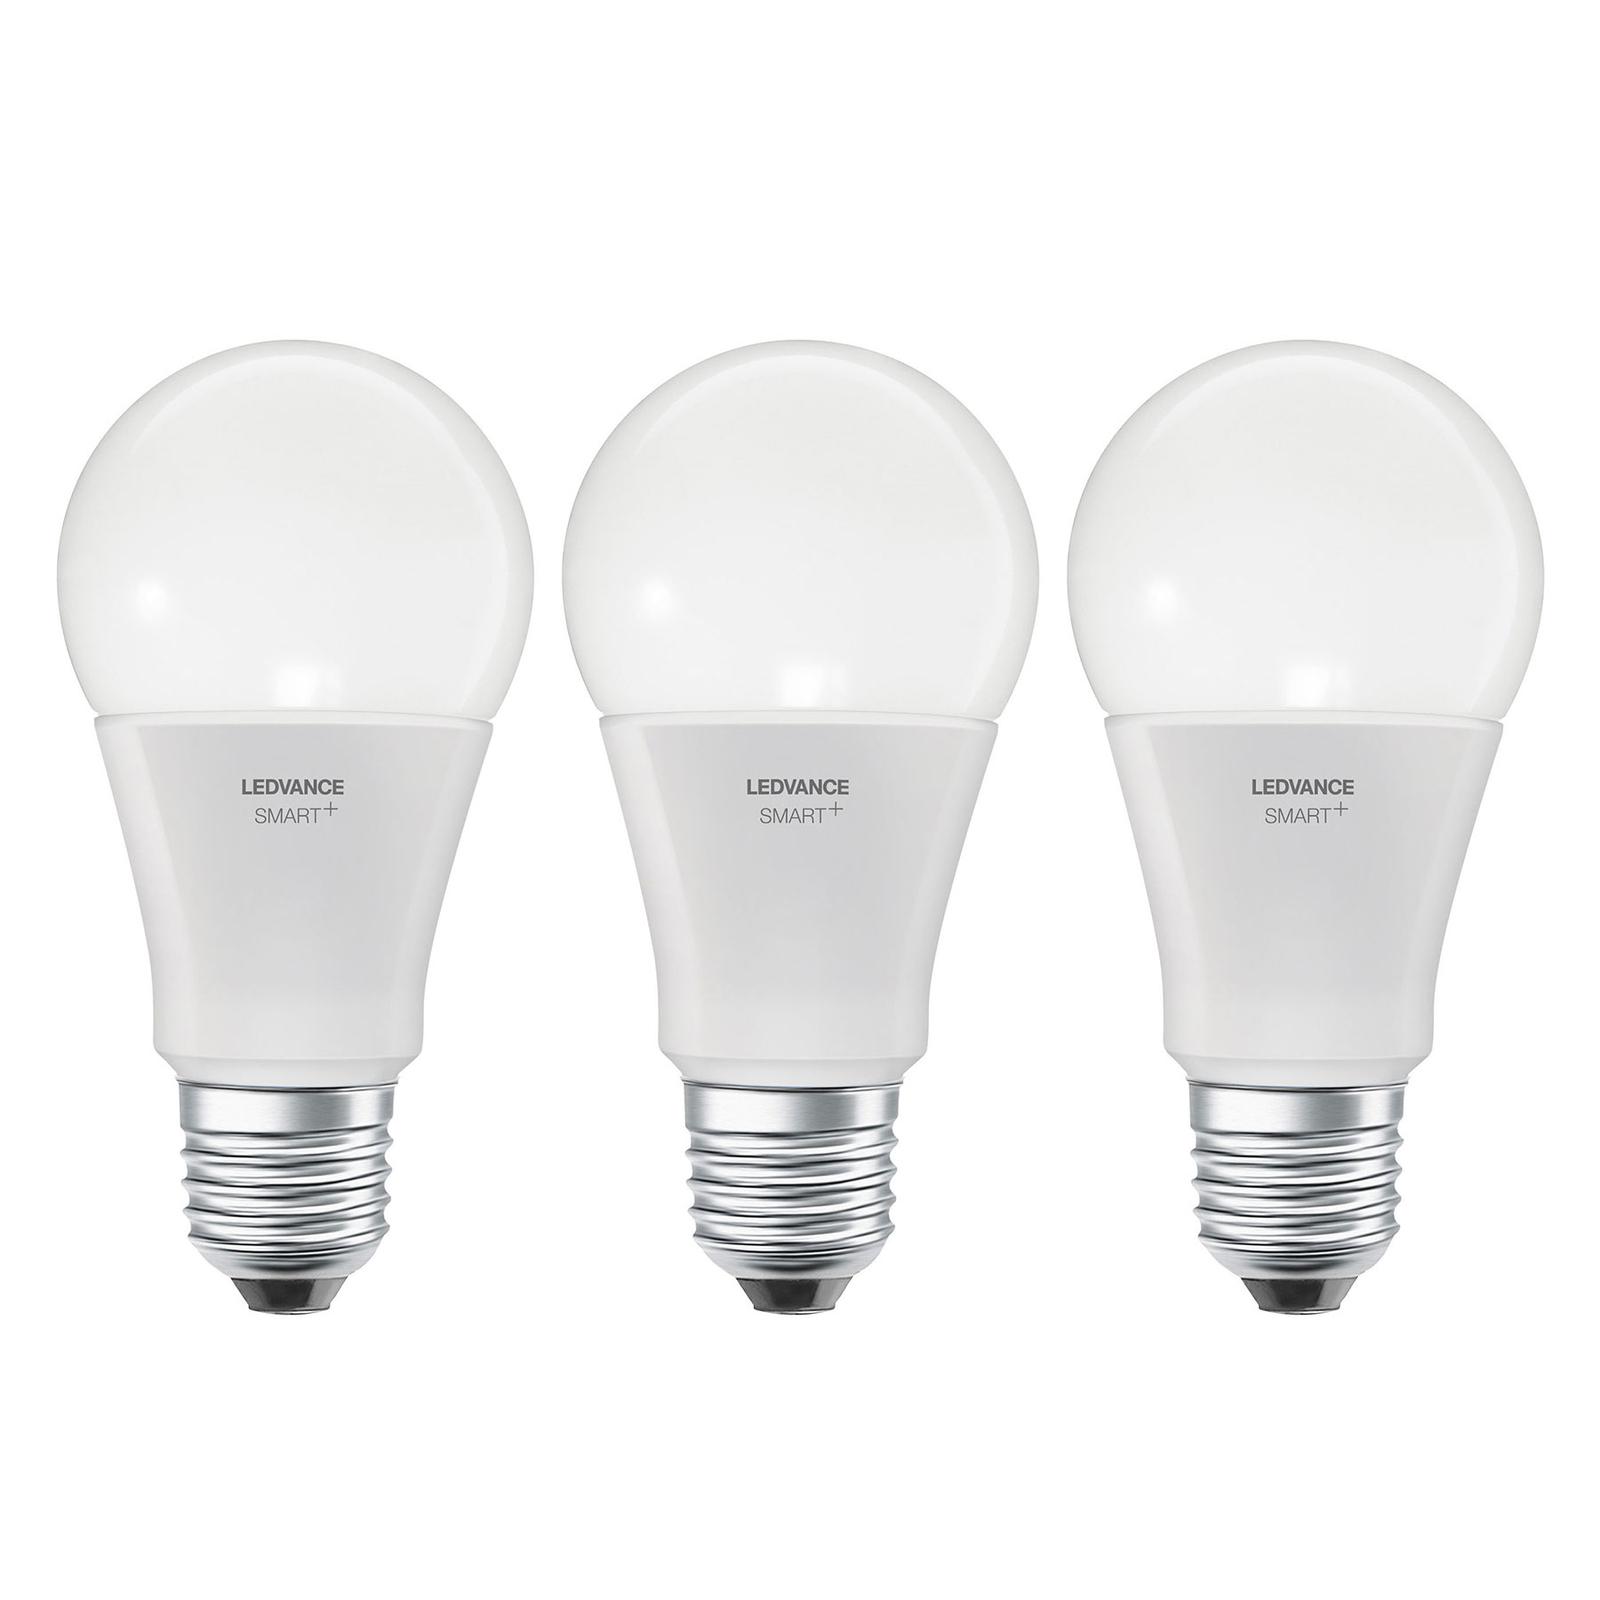 LEDVANCE SMART+ WiFi E27 9,5W Classic CCT 3-er